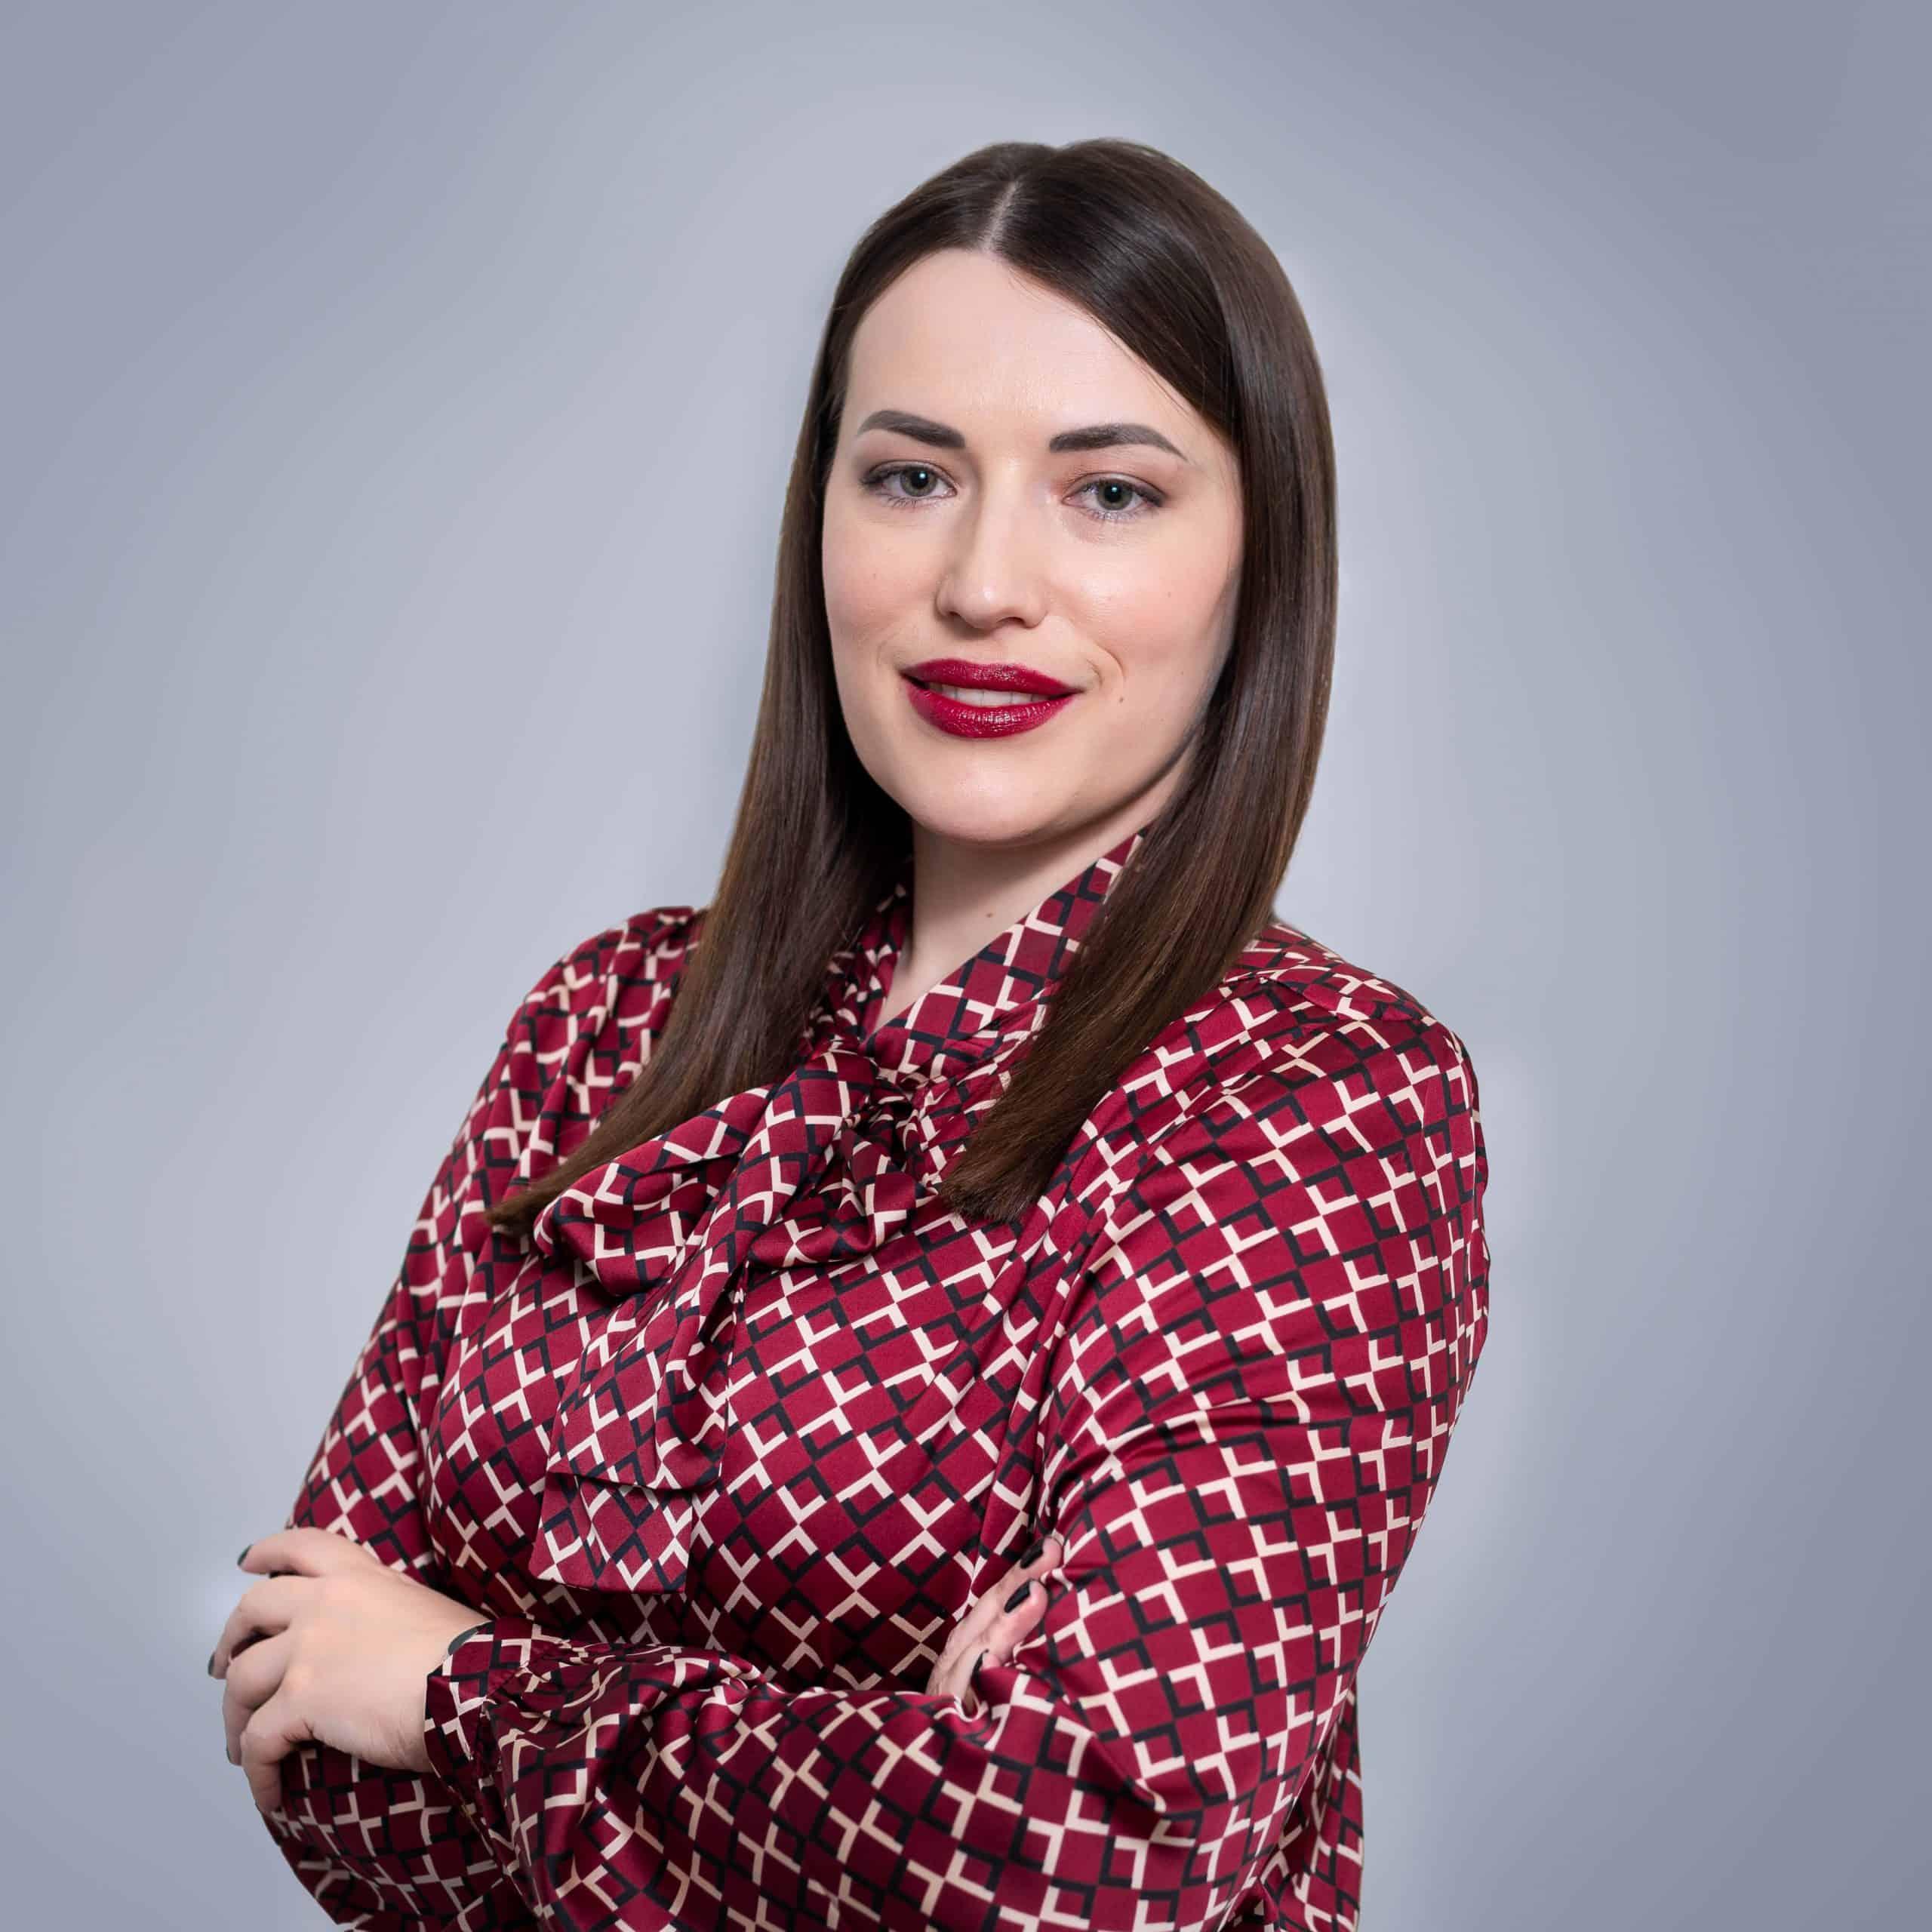 zlata lukic, Advokat Beograd, Milosevic Law Firm, Advokatska Kancelarija Milosević